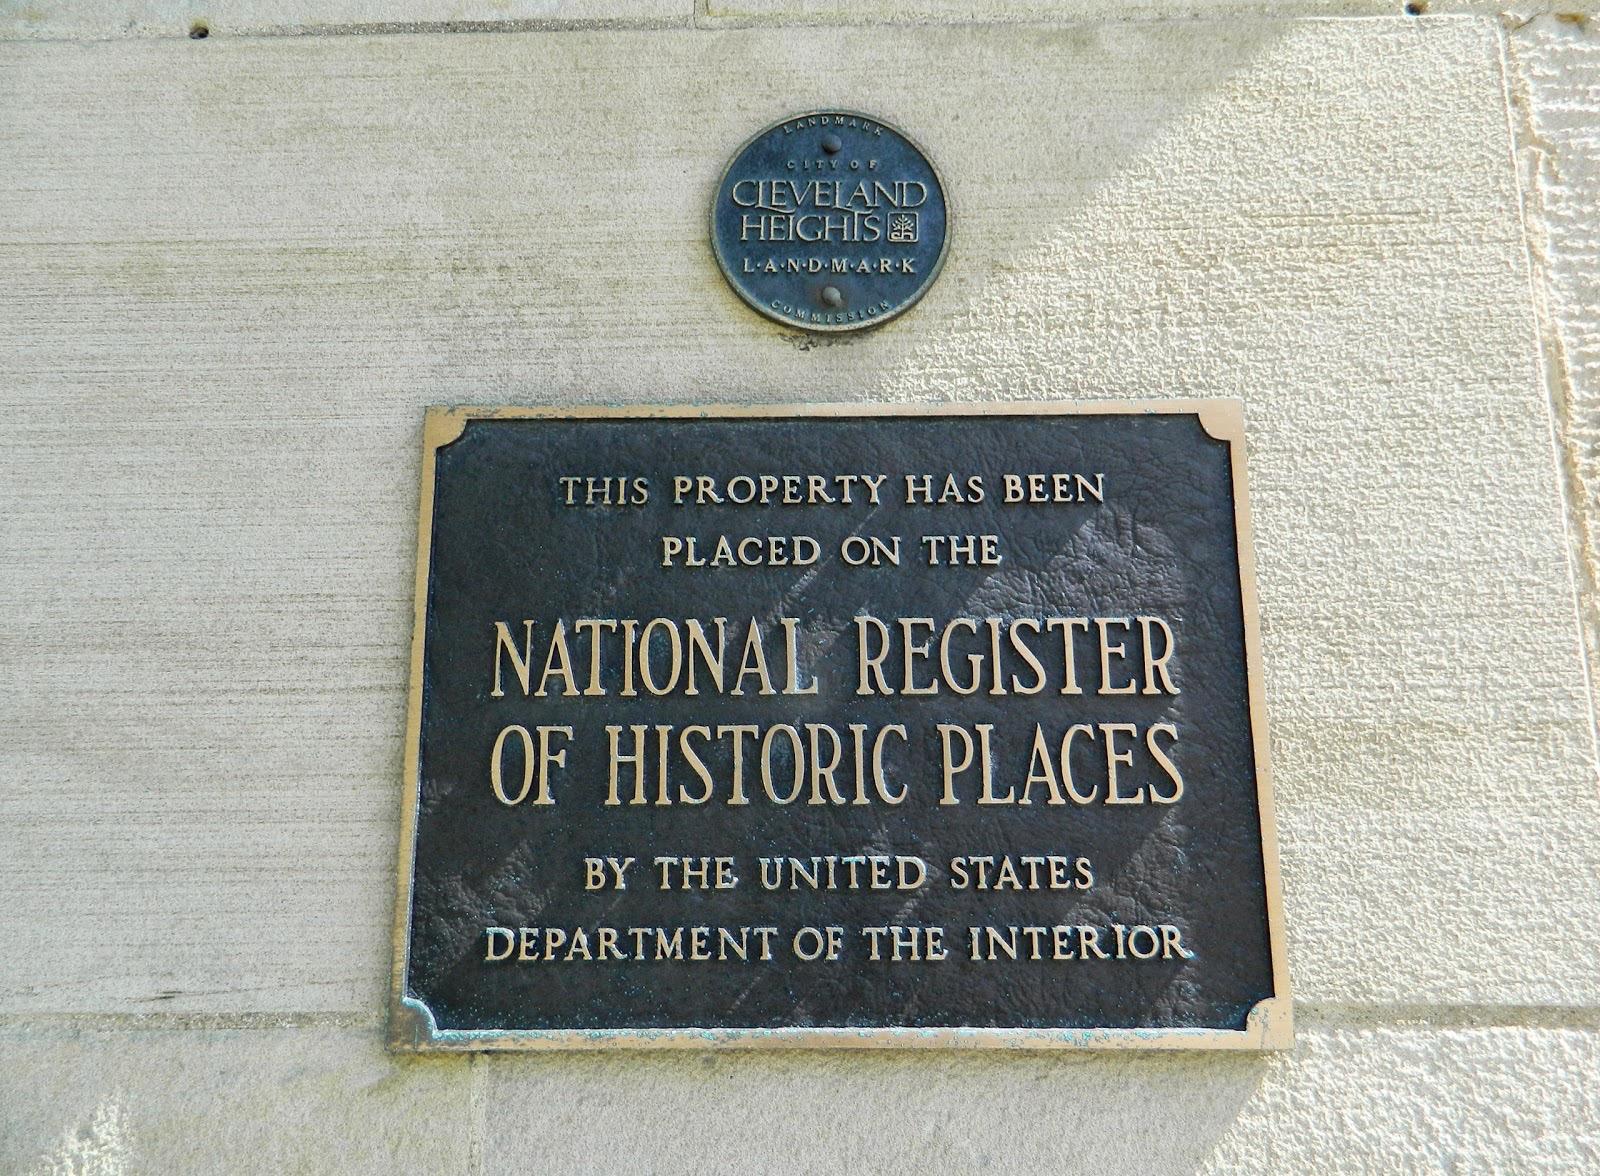 20130430012 Cleveland Hgts Heights Rockefeller Building historic landmark marker.jpg